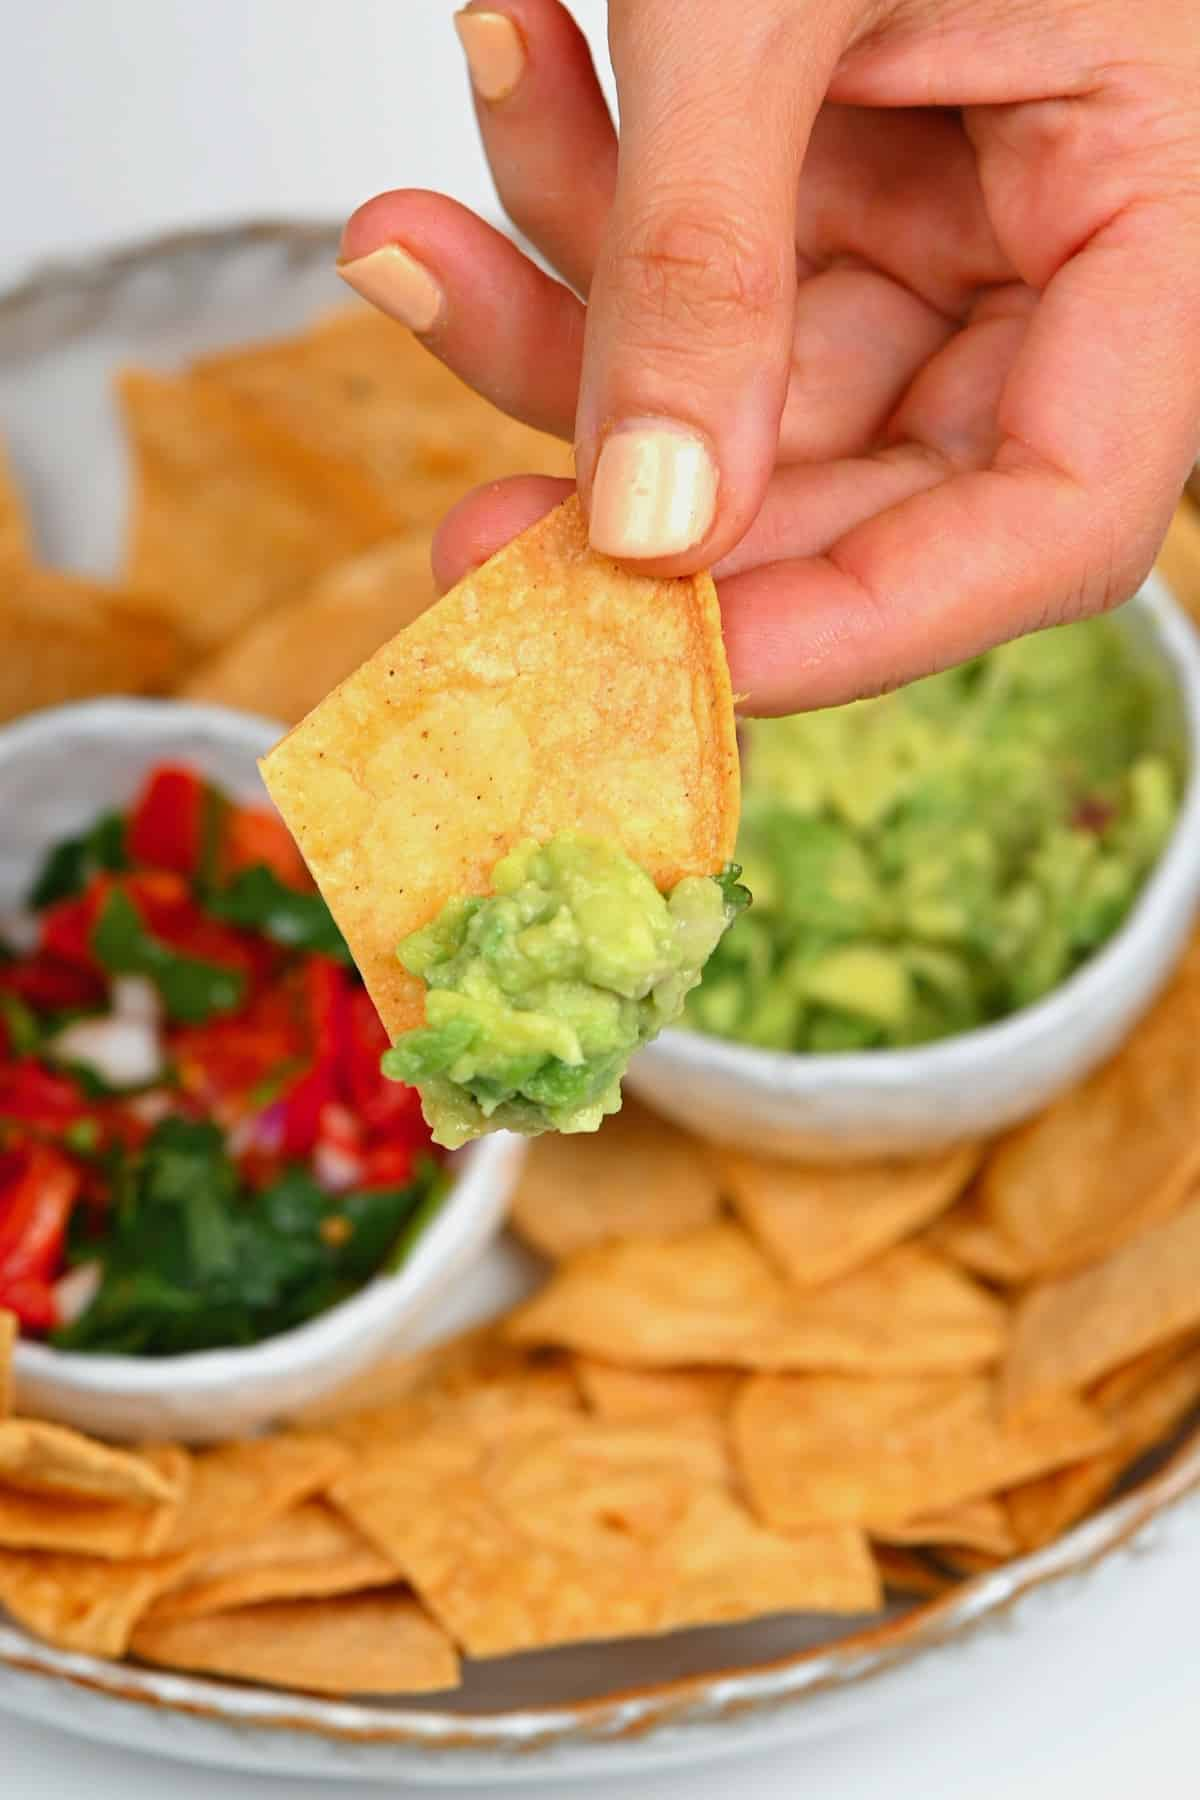 Corn tortilla chips dips in guacamole